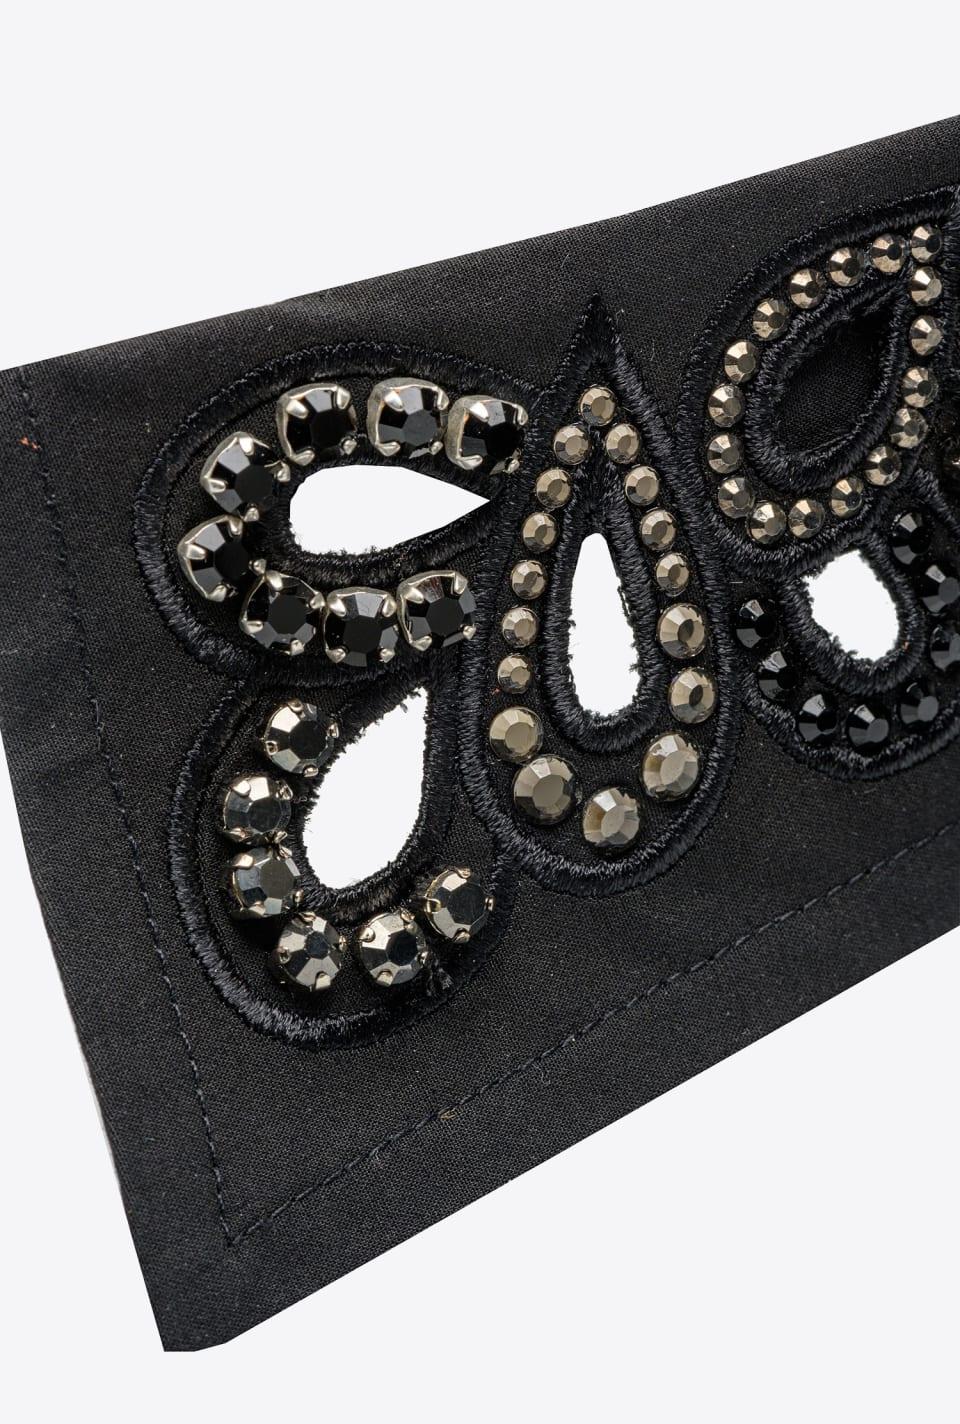 Poplin collar with jewel embroidery - Pinko